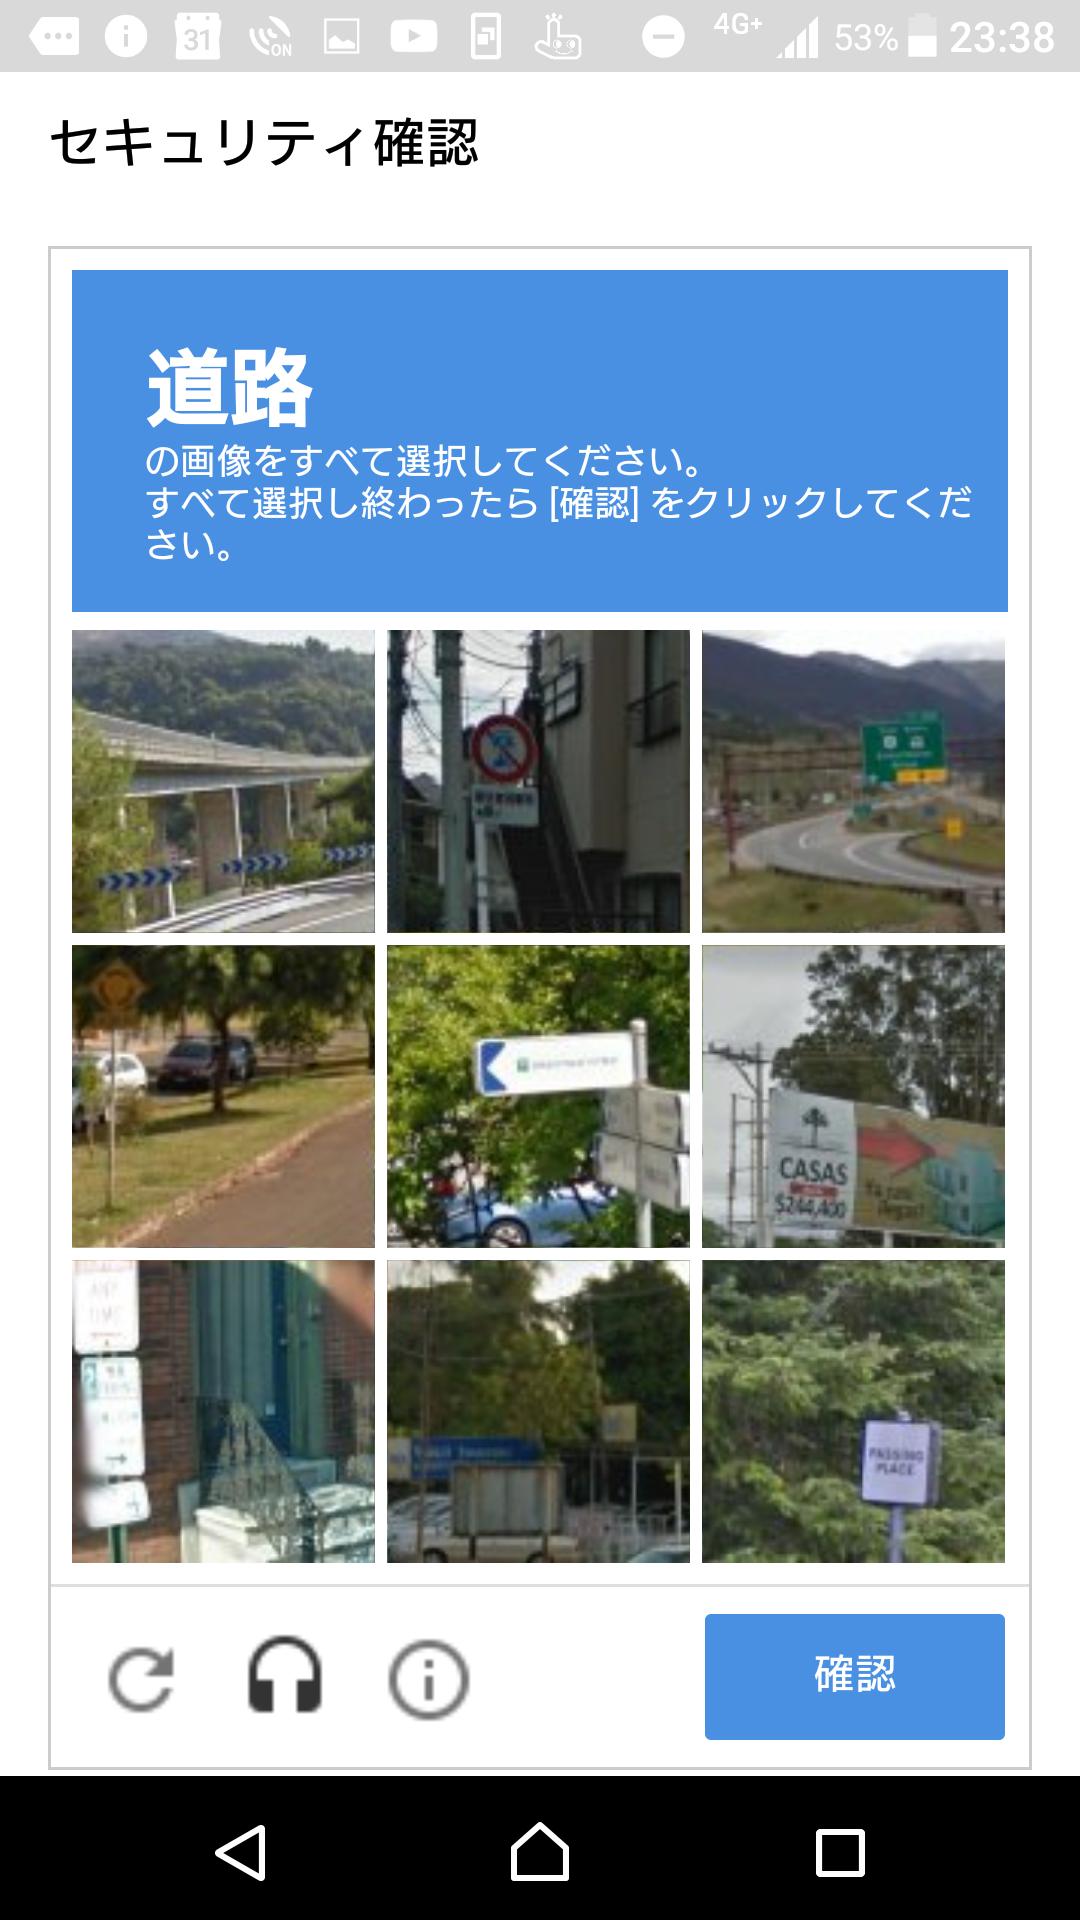 Screenshot_20180516-233811.png